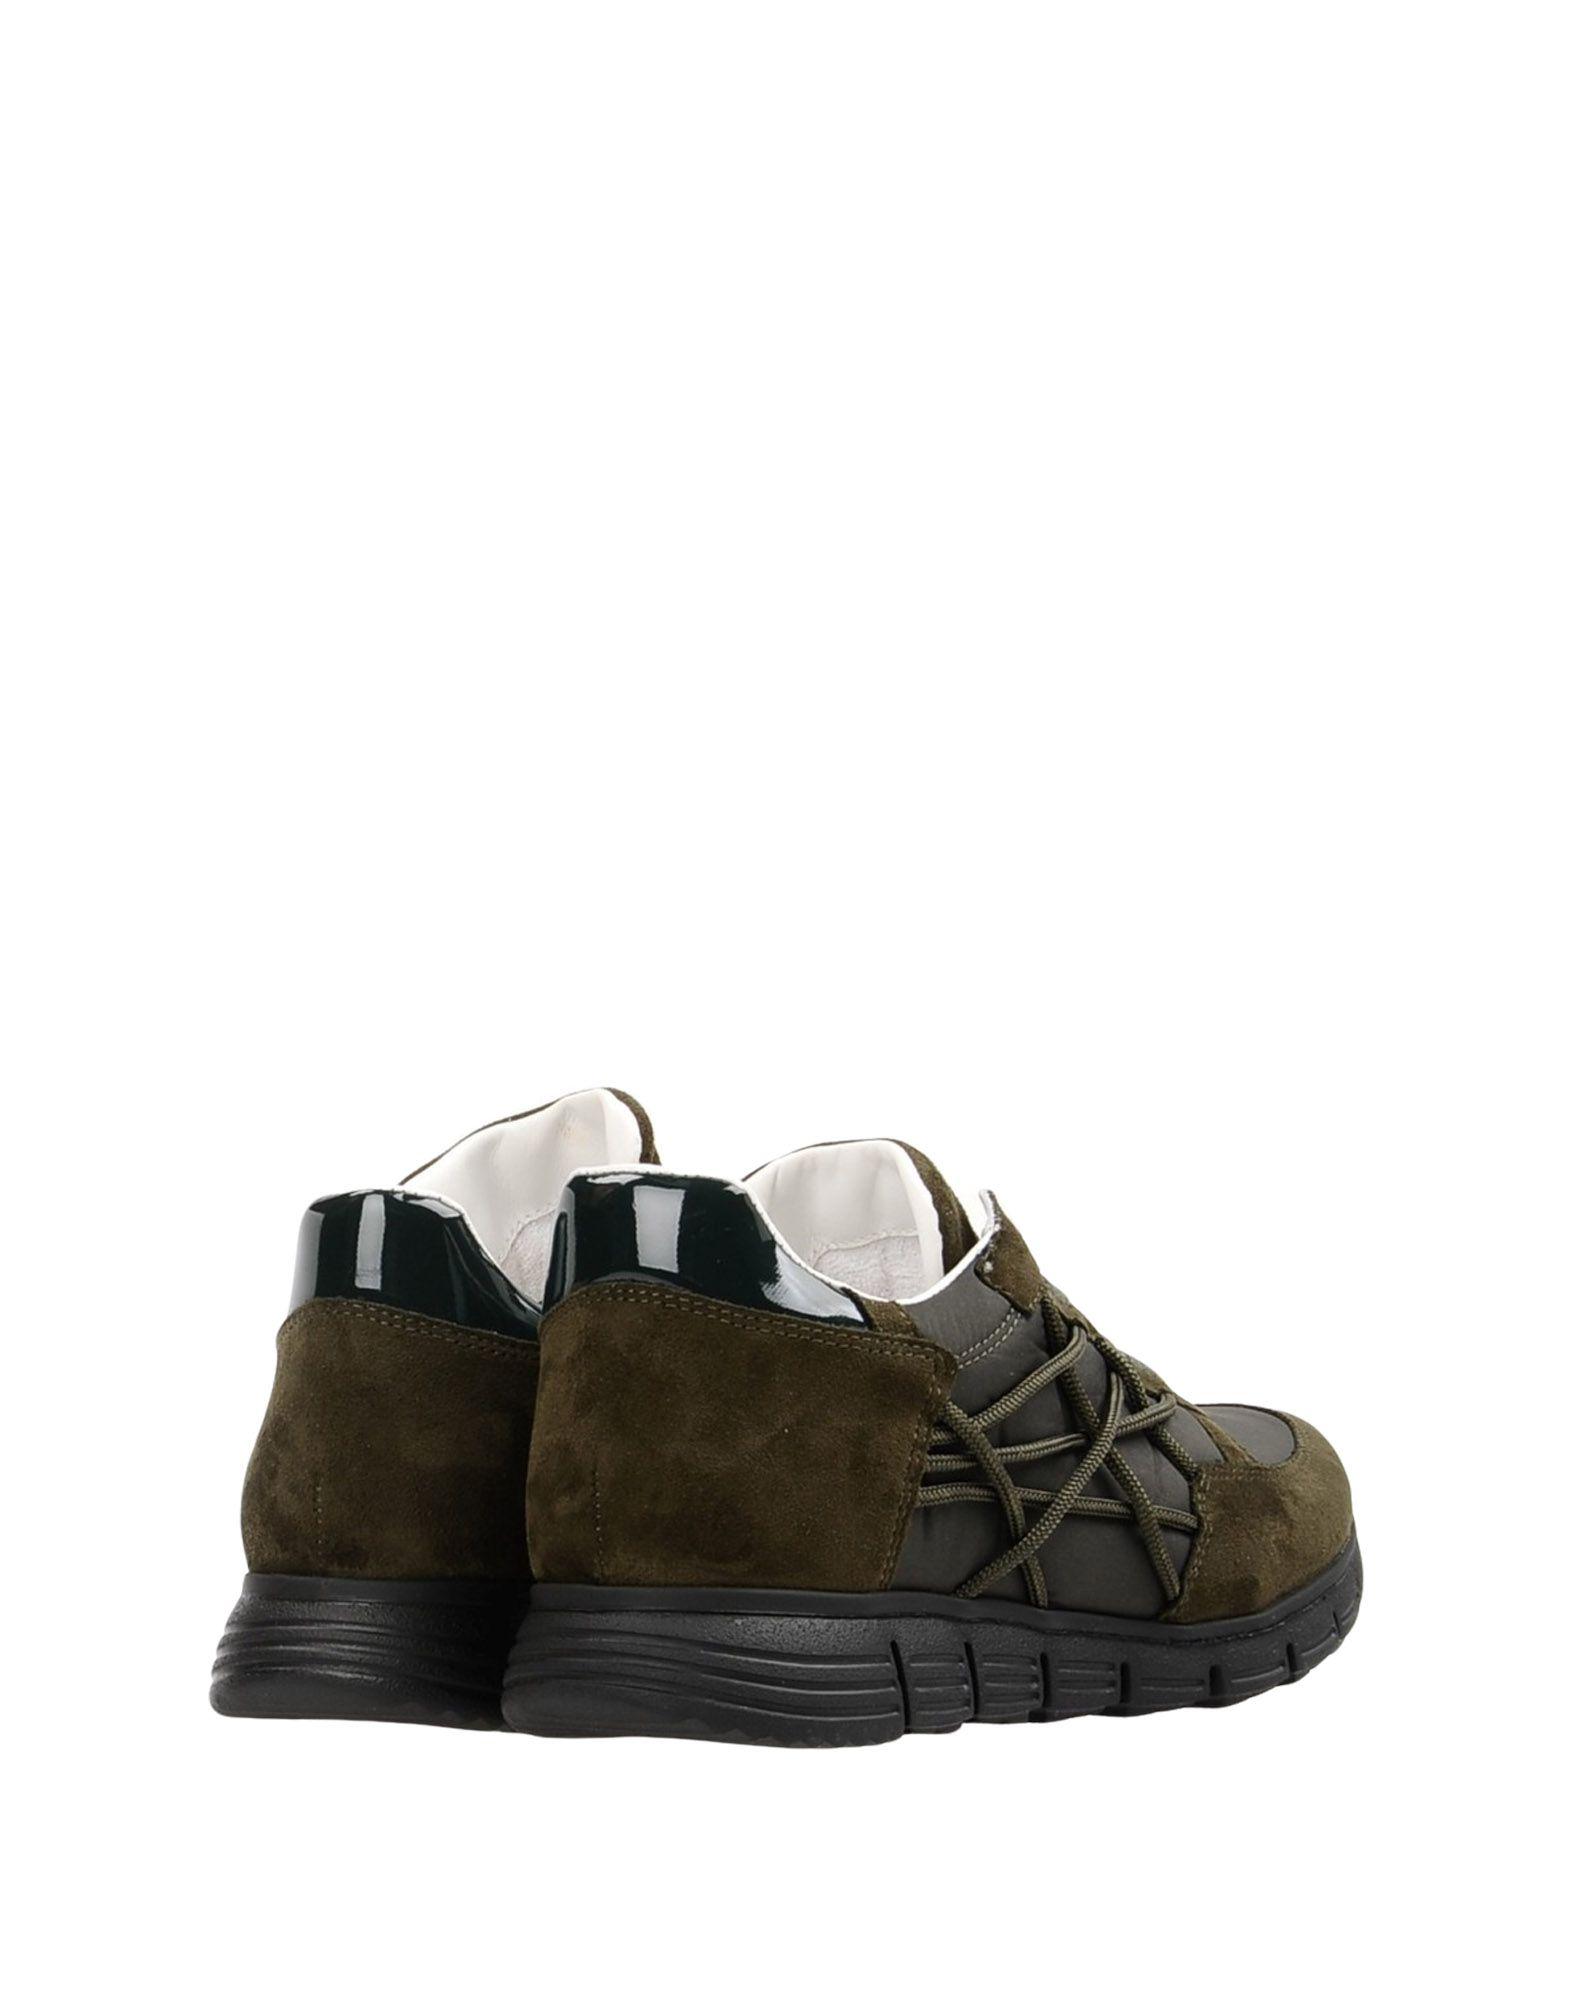 L4k3 11334980HT Sneakers Damen  11334980HT L4k3 Gute Qualität beliebte Schuhe ab03e1